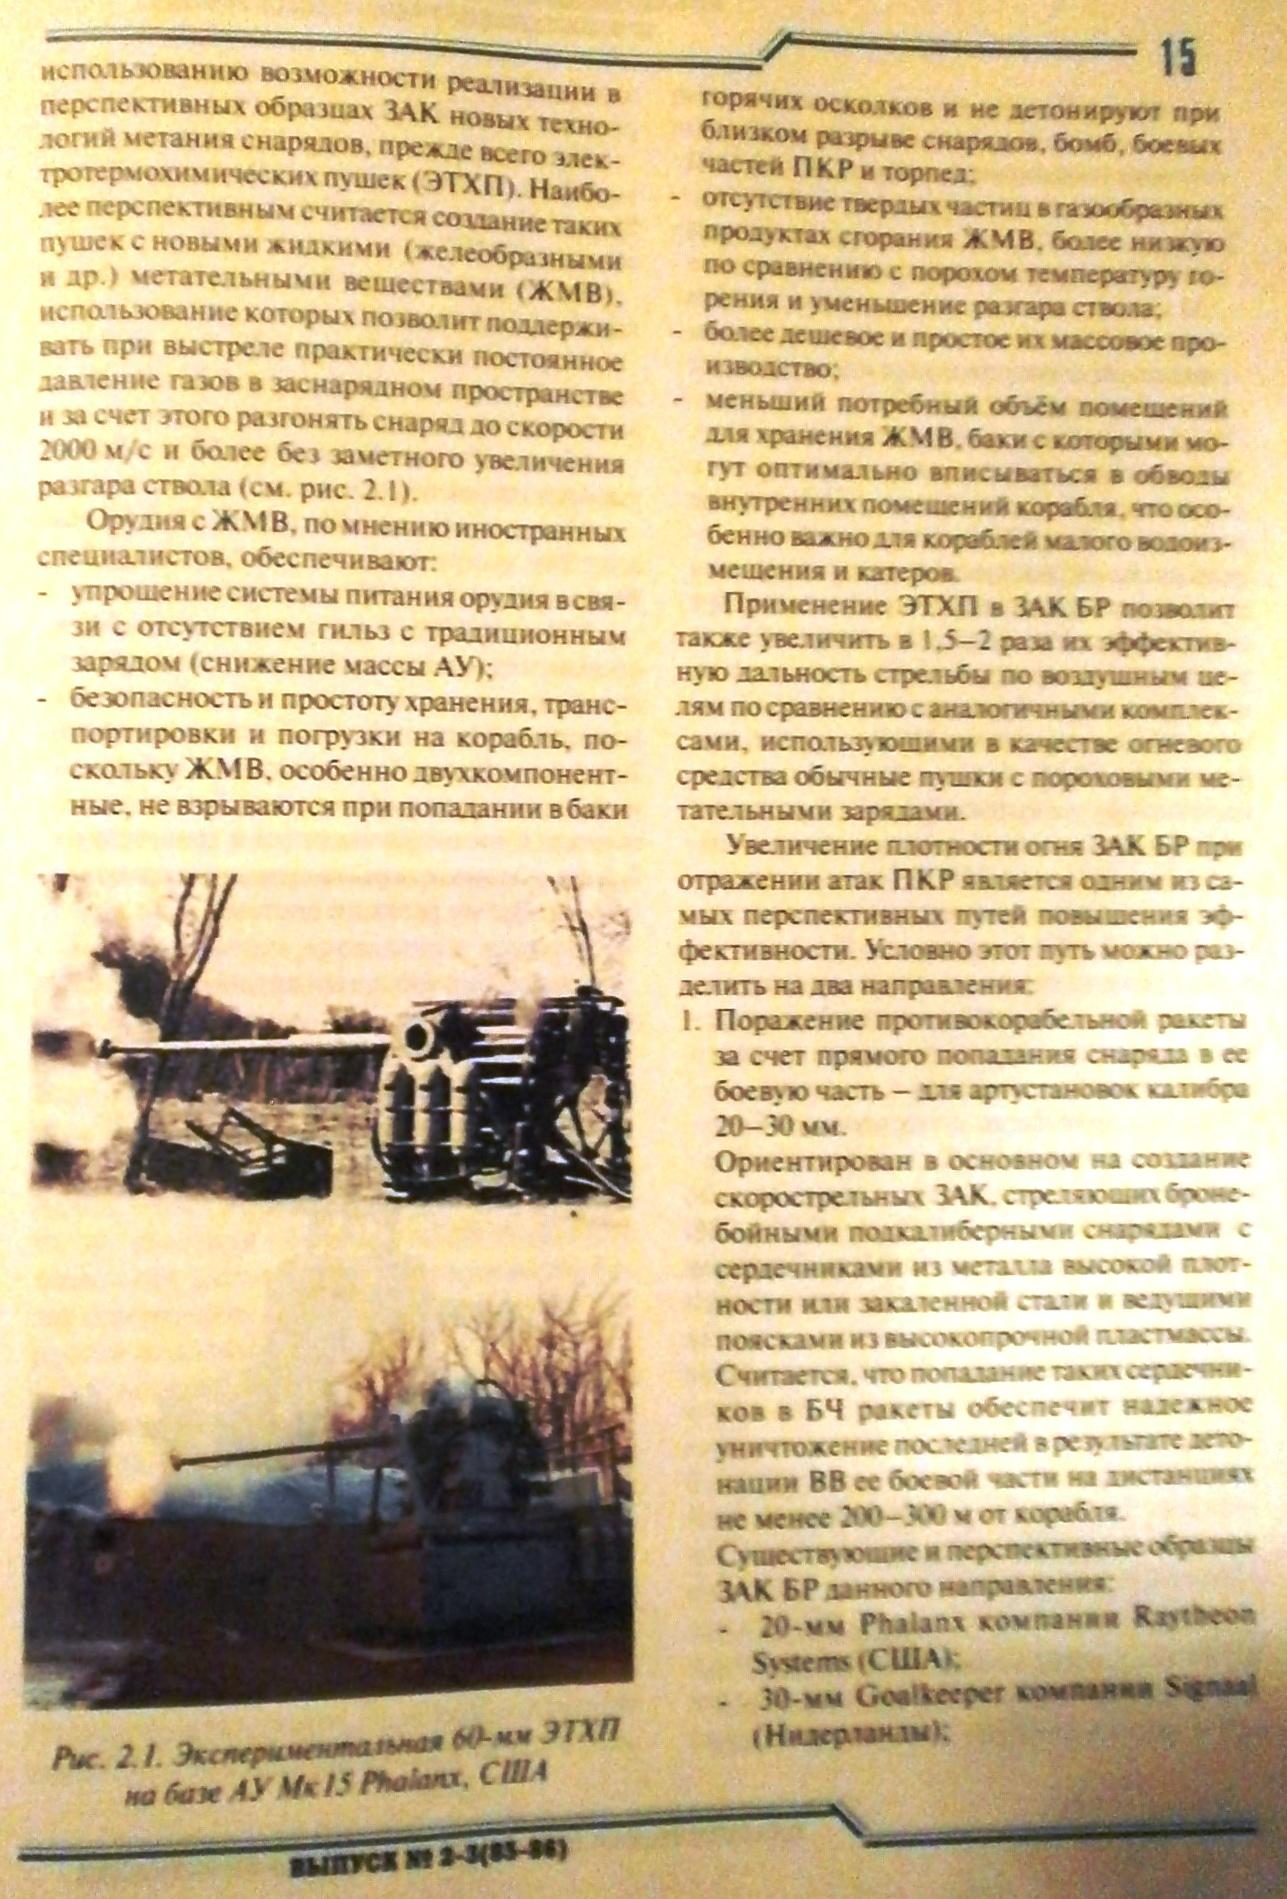 http://s3.uploads.ru/6lupa.jpg